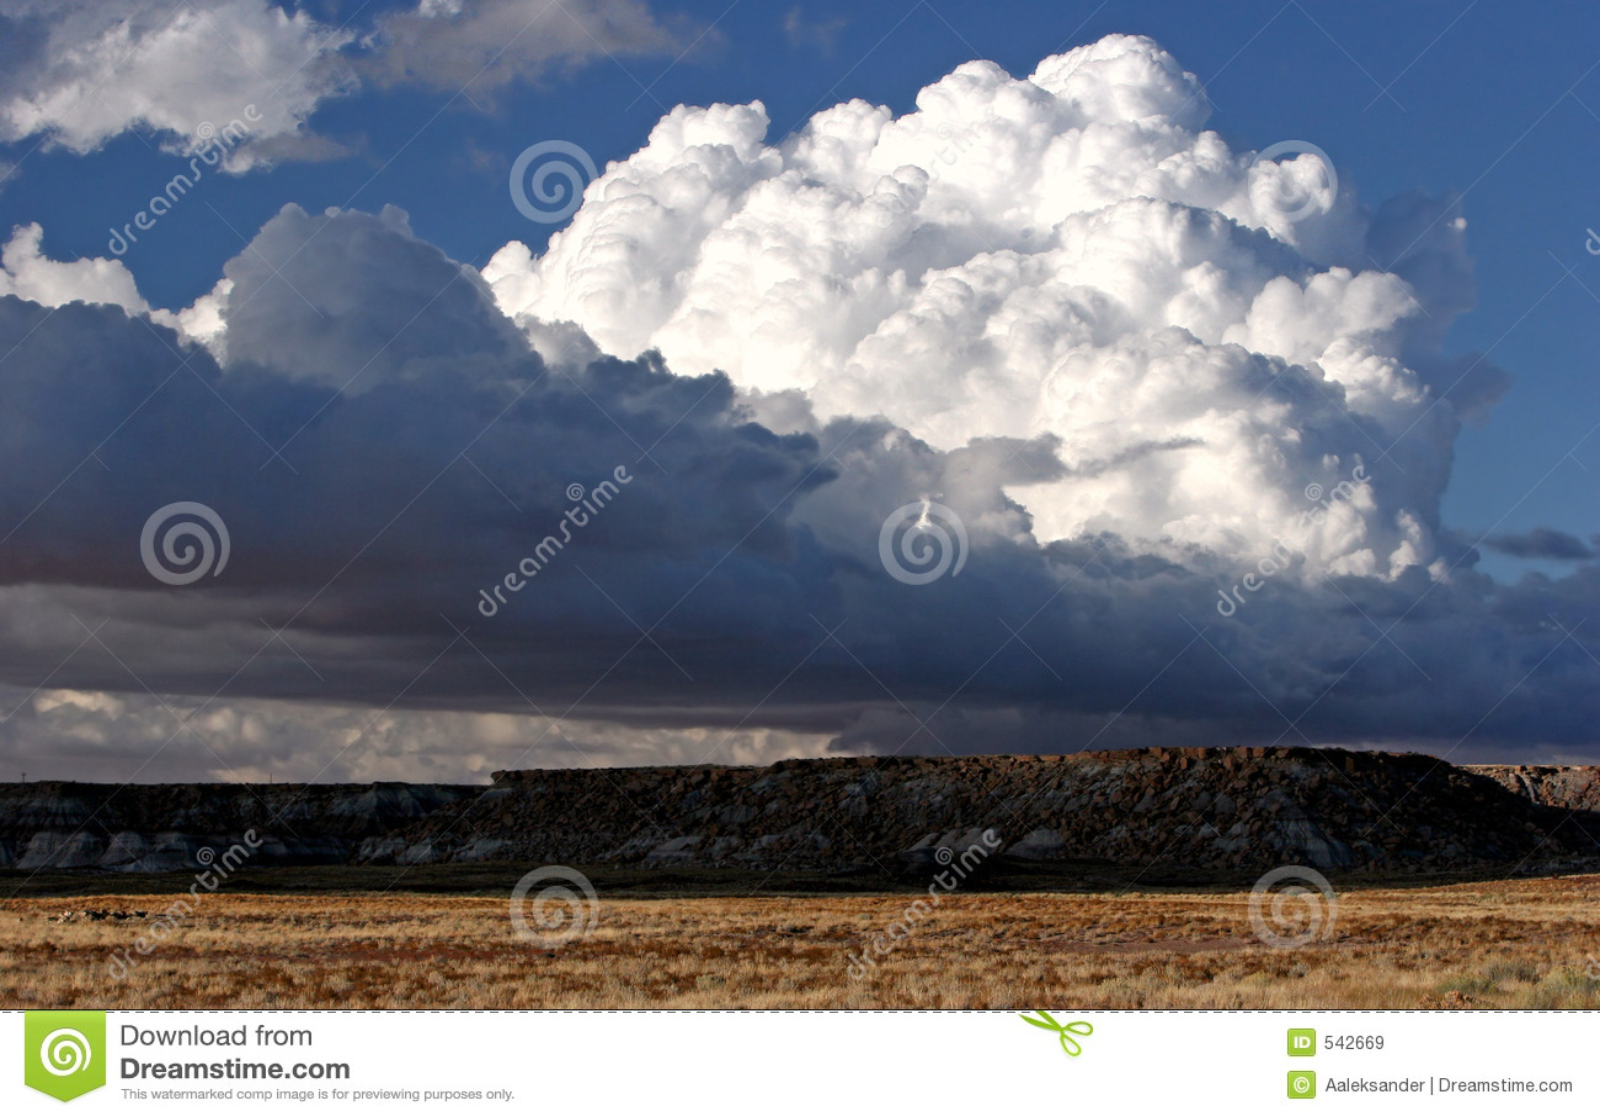 Download 亚利桑那 库存图片. 图片 包括有 空间, 浪费, 沙漠, 岩石, 本质, 国家(地区), 蓬松, 昼夜平分点 - 542669